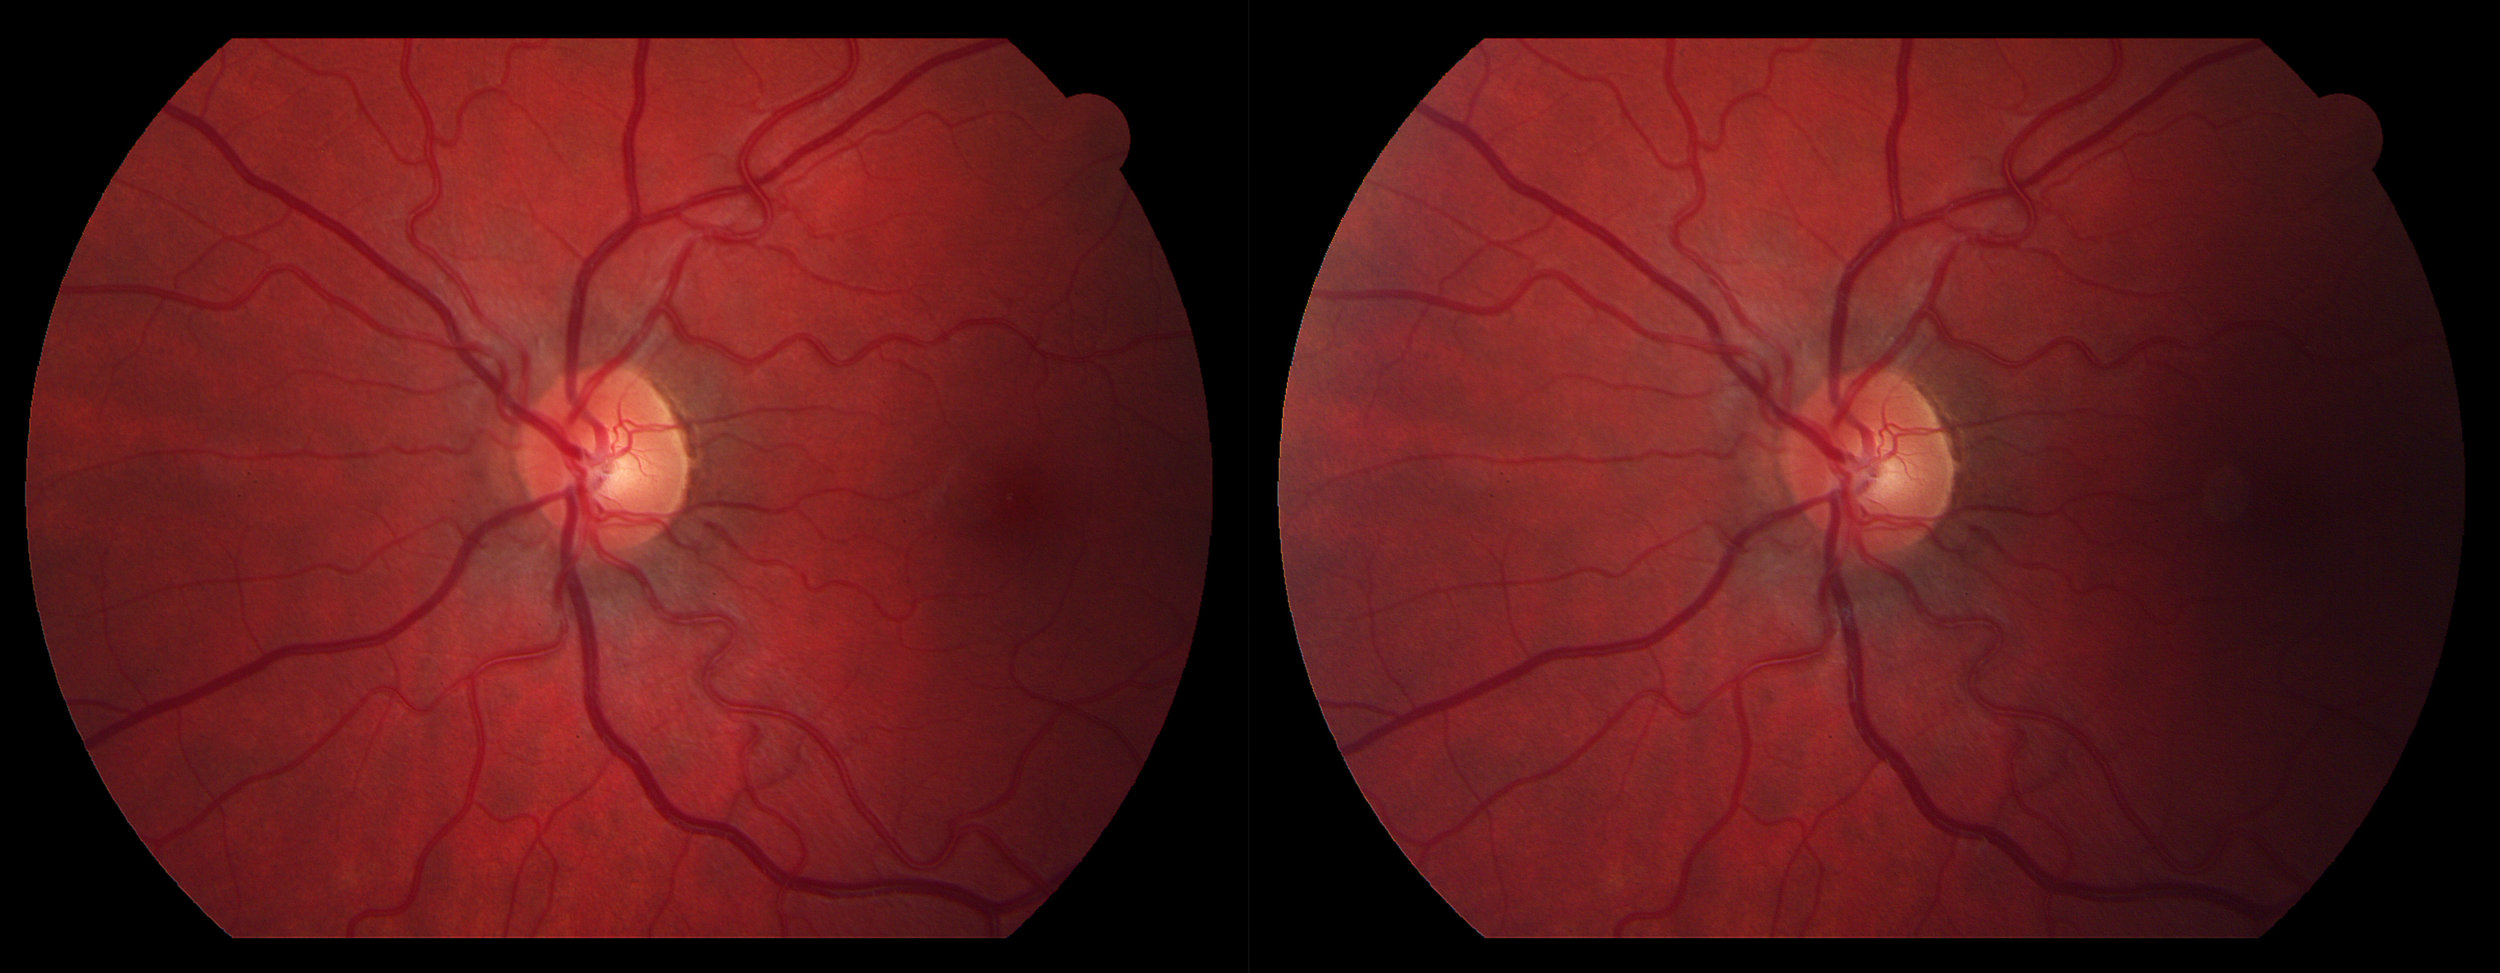 Oculus Sinister: Optic Disc Centered